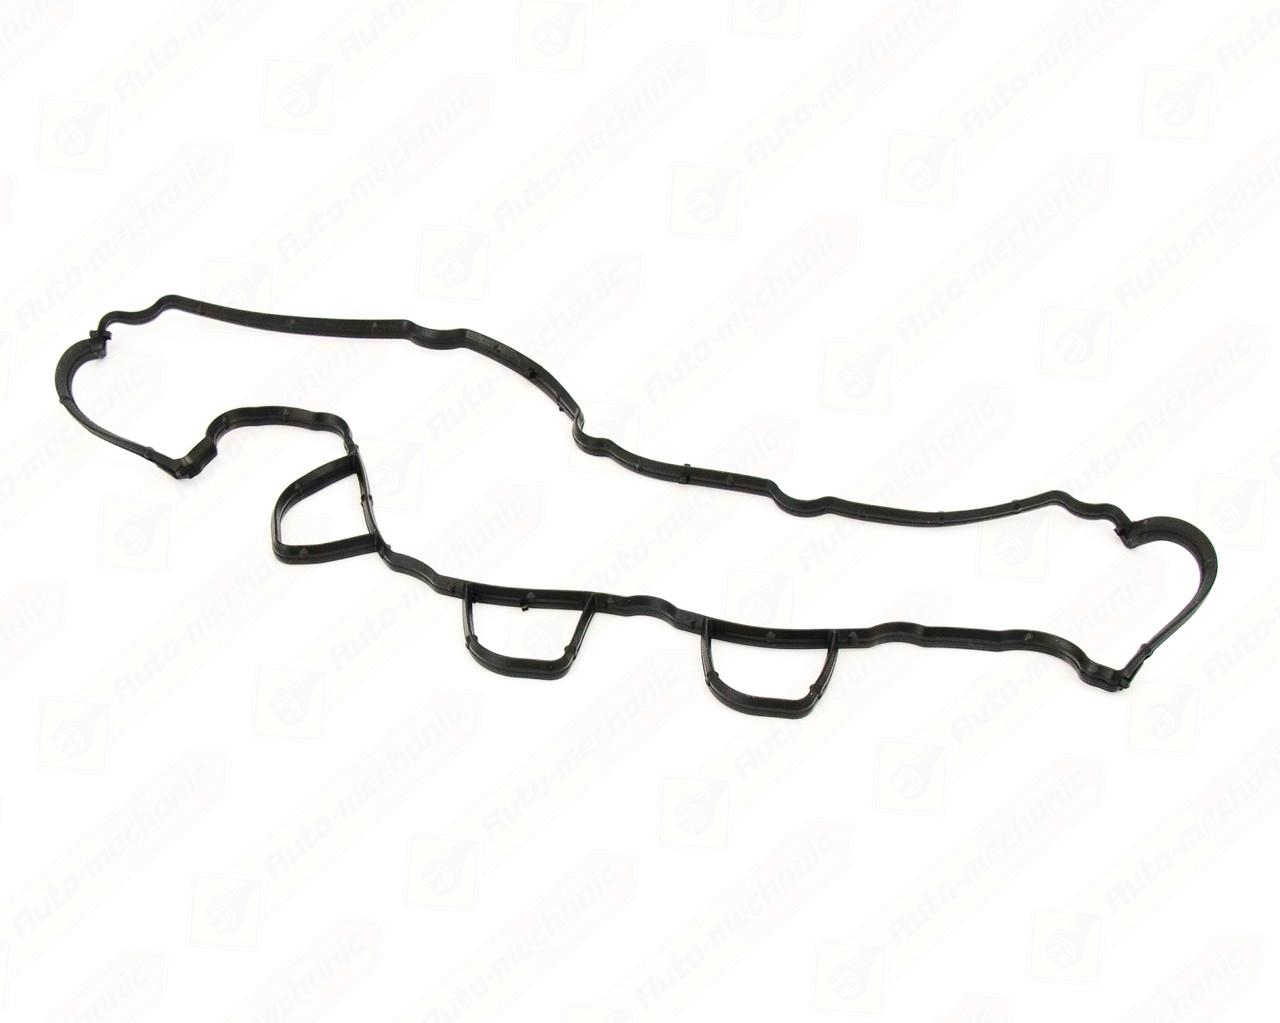 Прокладка клапанної кришки на Renault Kangoo II 2008-> 1.5 dCi — Victor Reinz - 71-40854-00